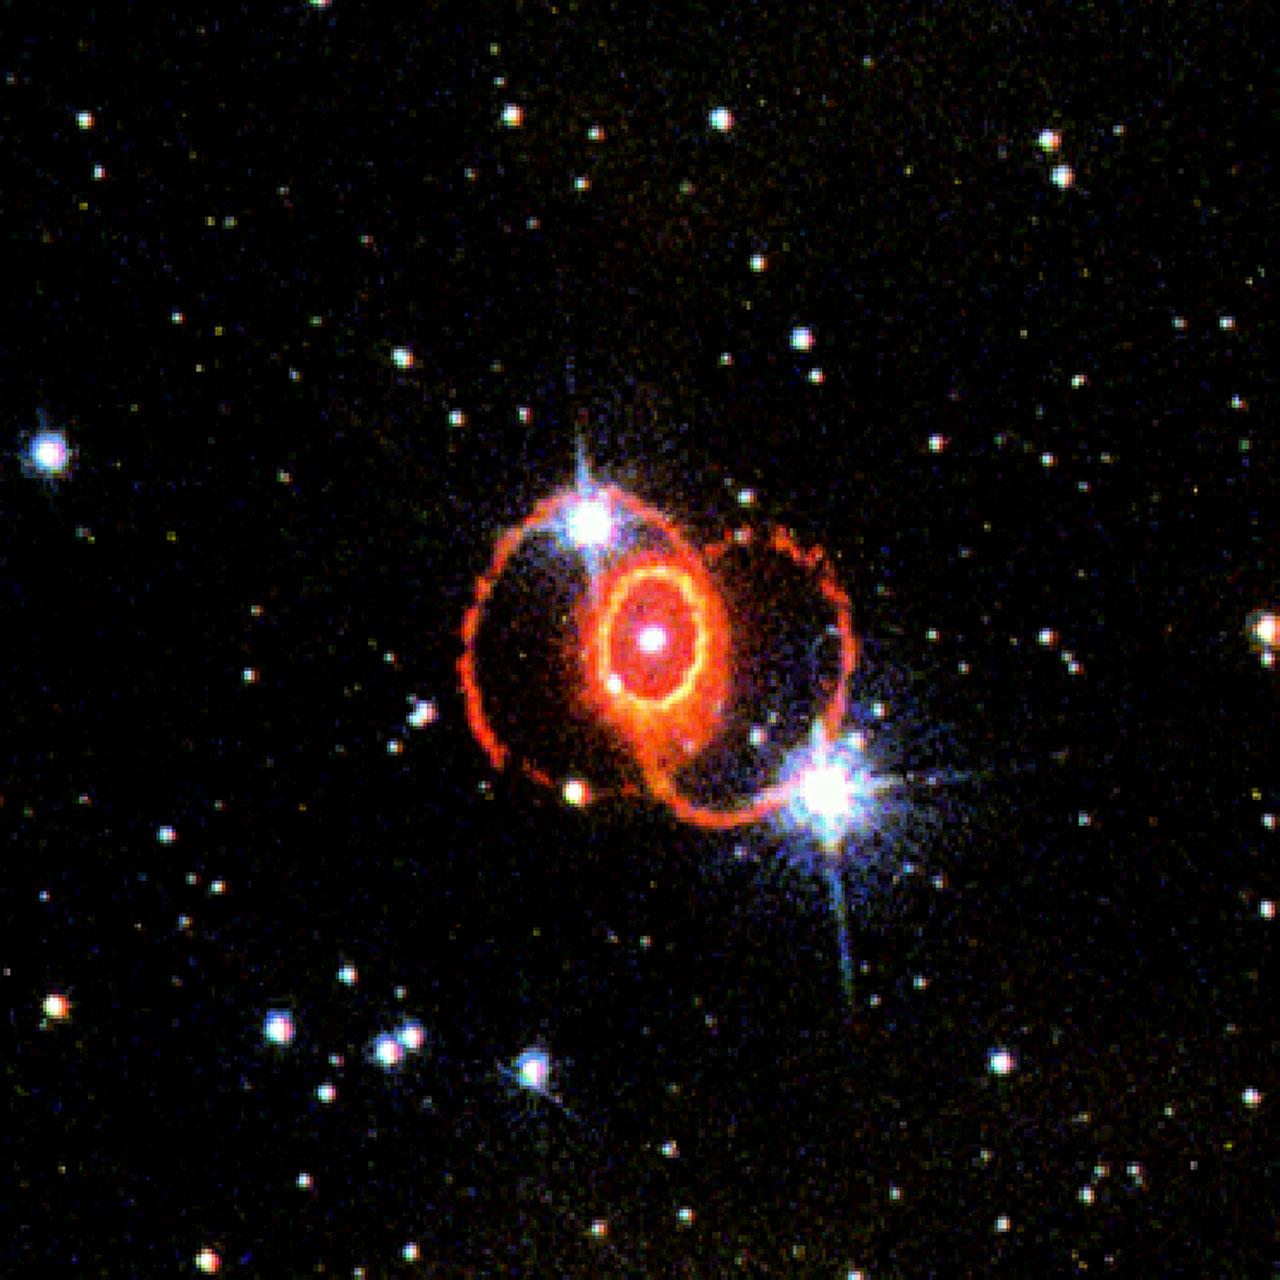 STIS Chemically Analyzes the Ring Around SN 1987a   ESA/Hubble